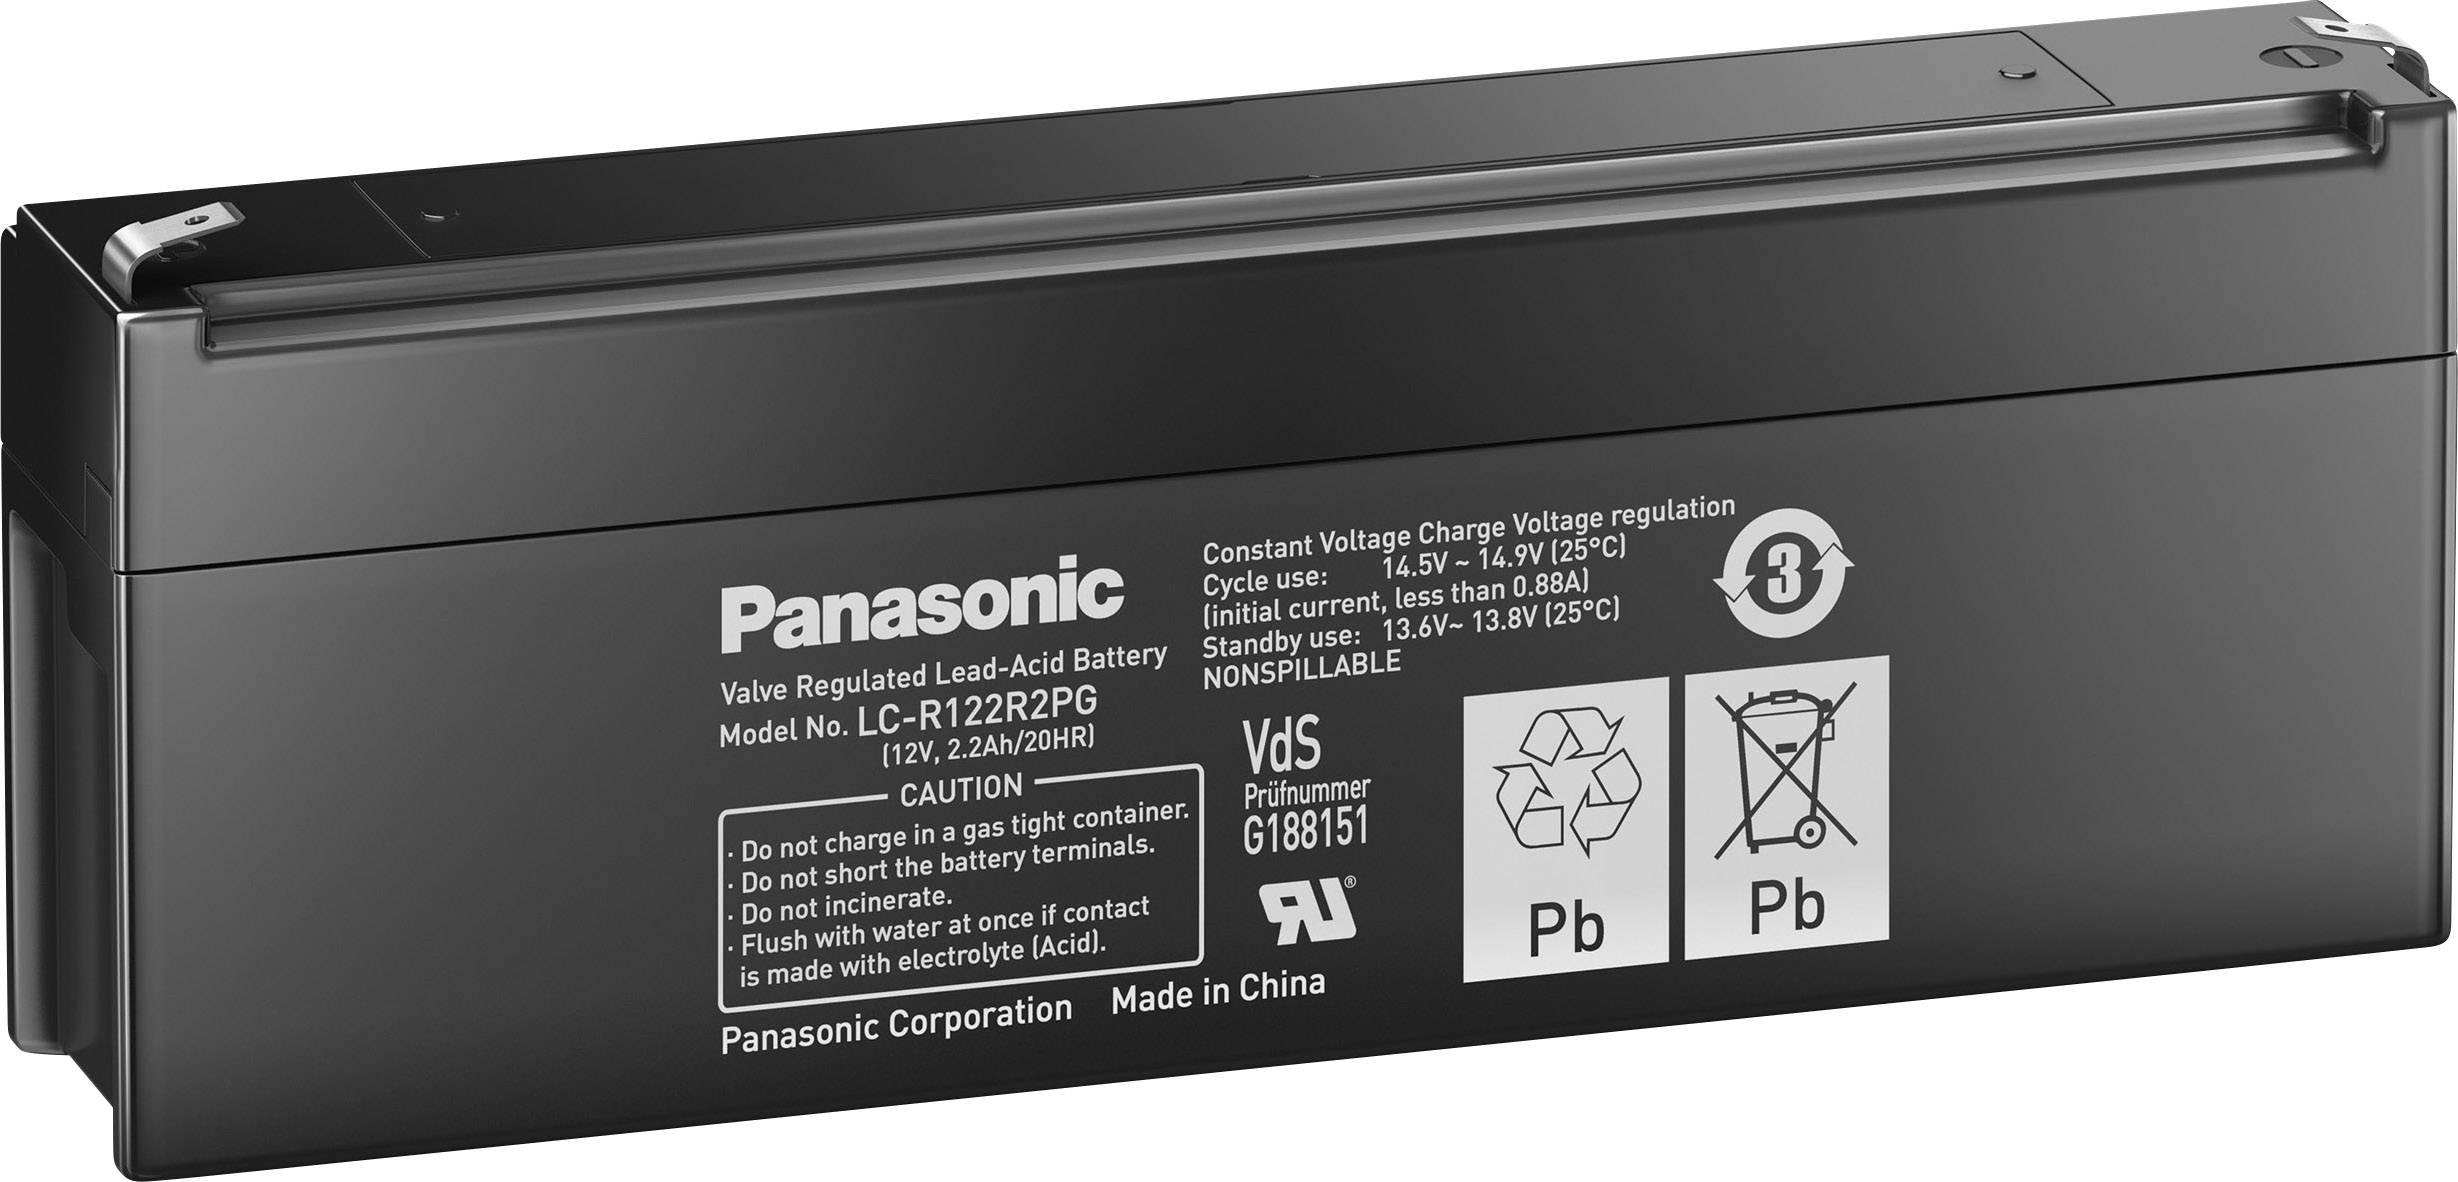 Olovený akumulátor Panasonic 12 V 2,2 Ah LC-R122R2PG, 2.2 Ah, 12 V